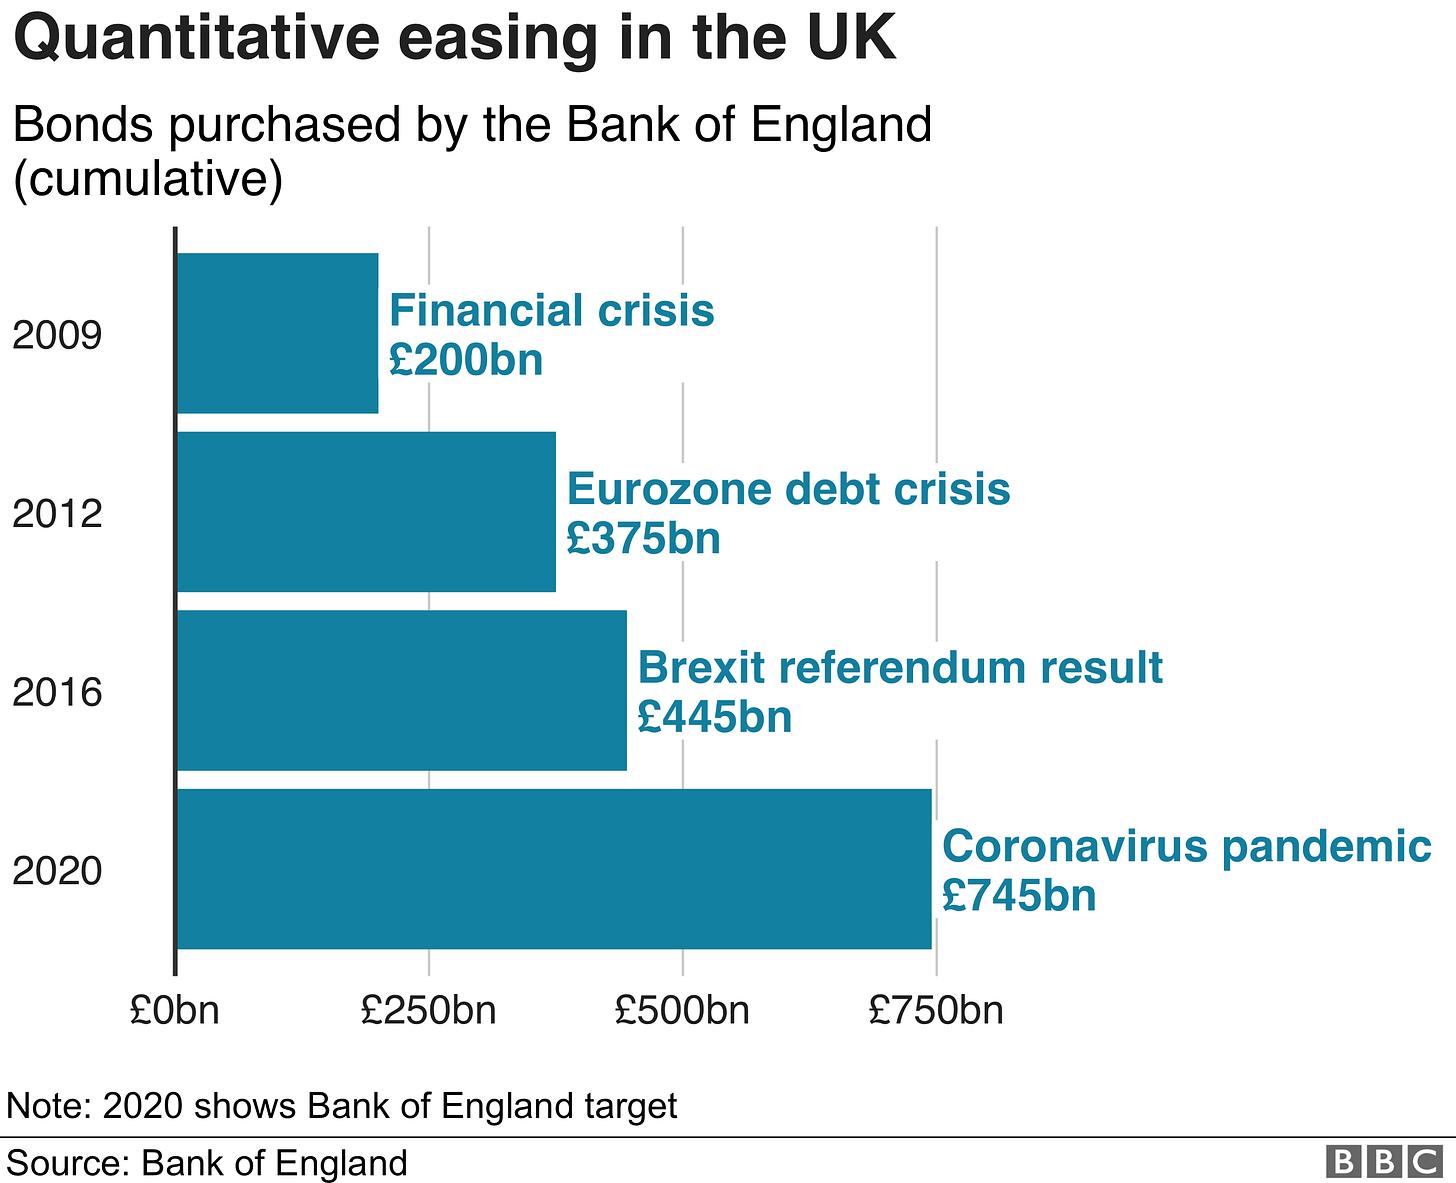 Quantitative easing in the UK